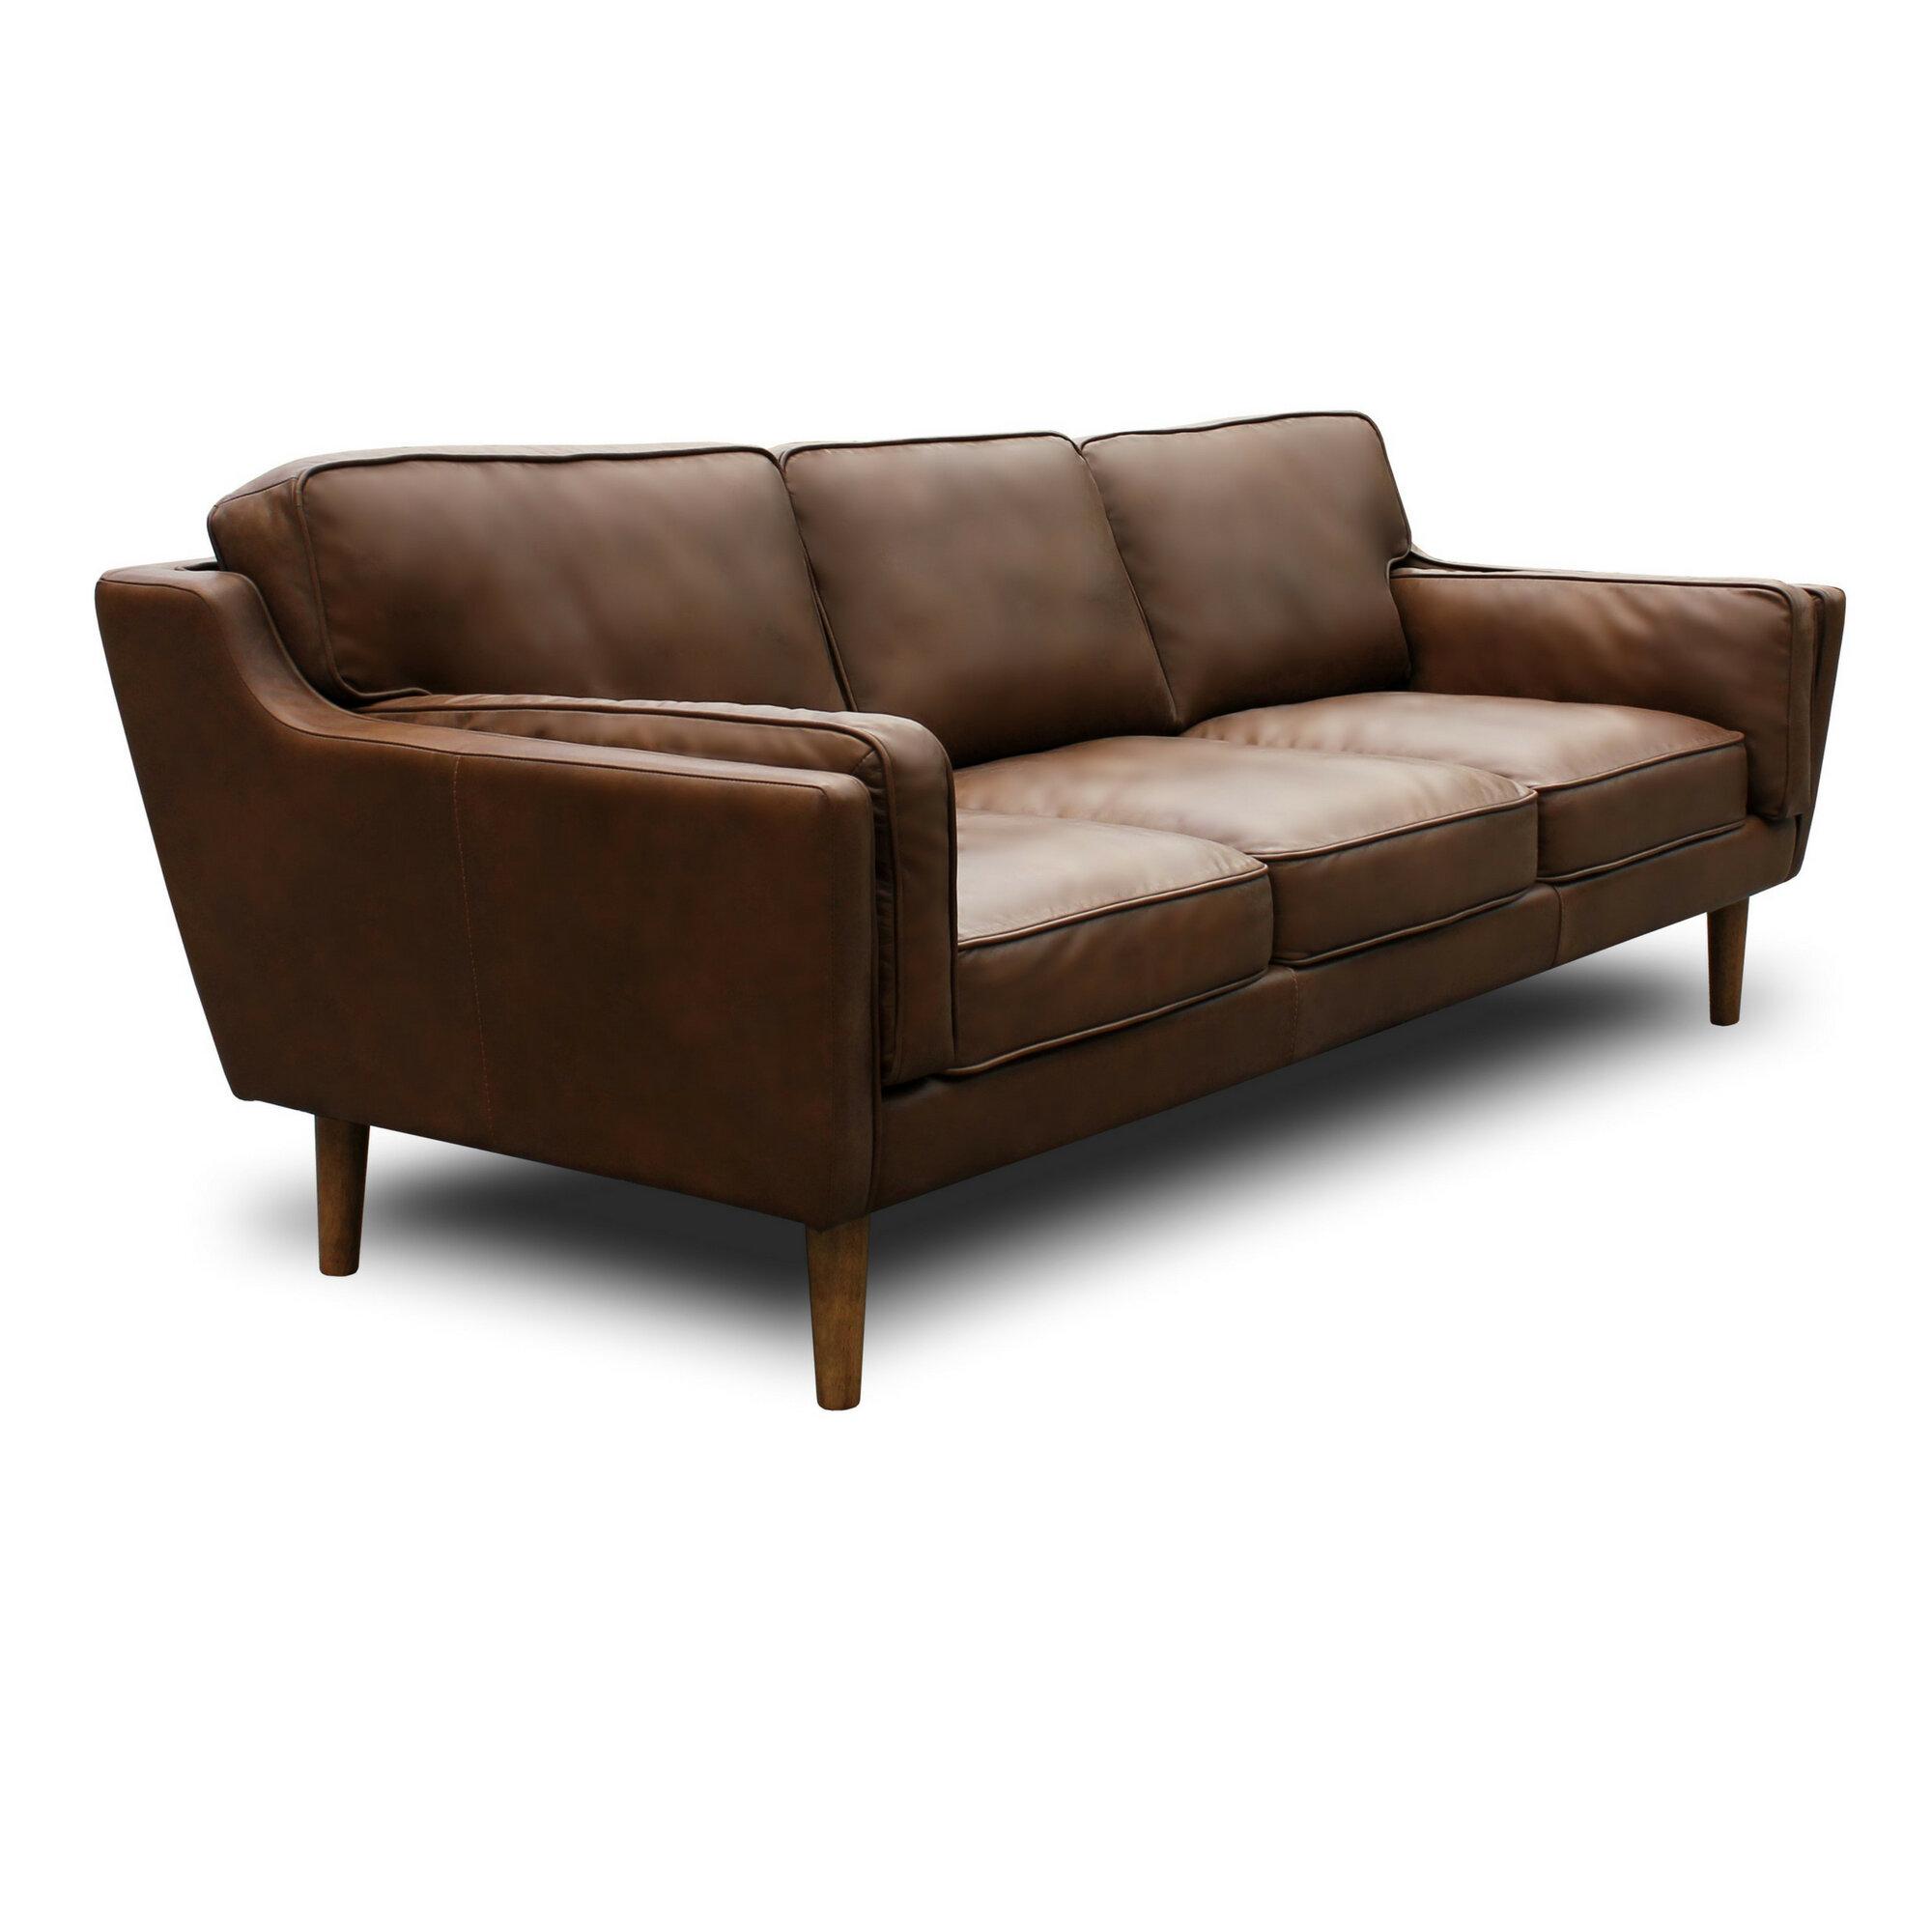 union rustic kaufman mid century modern leather sofa wayfair rh wayfair com contemporary leather sofa bed modern black leather sofa bed